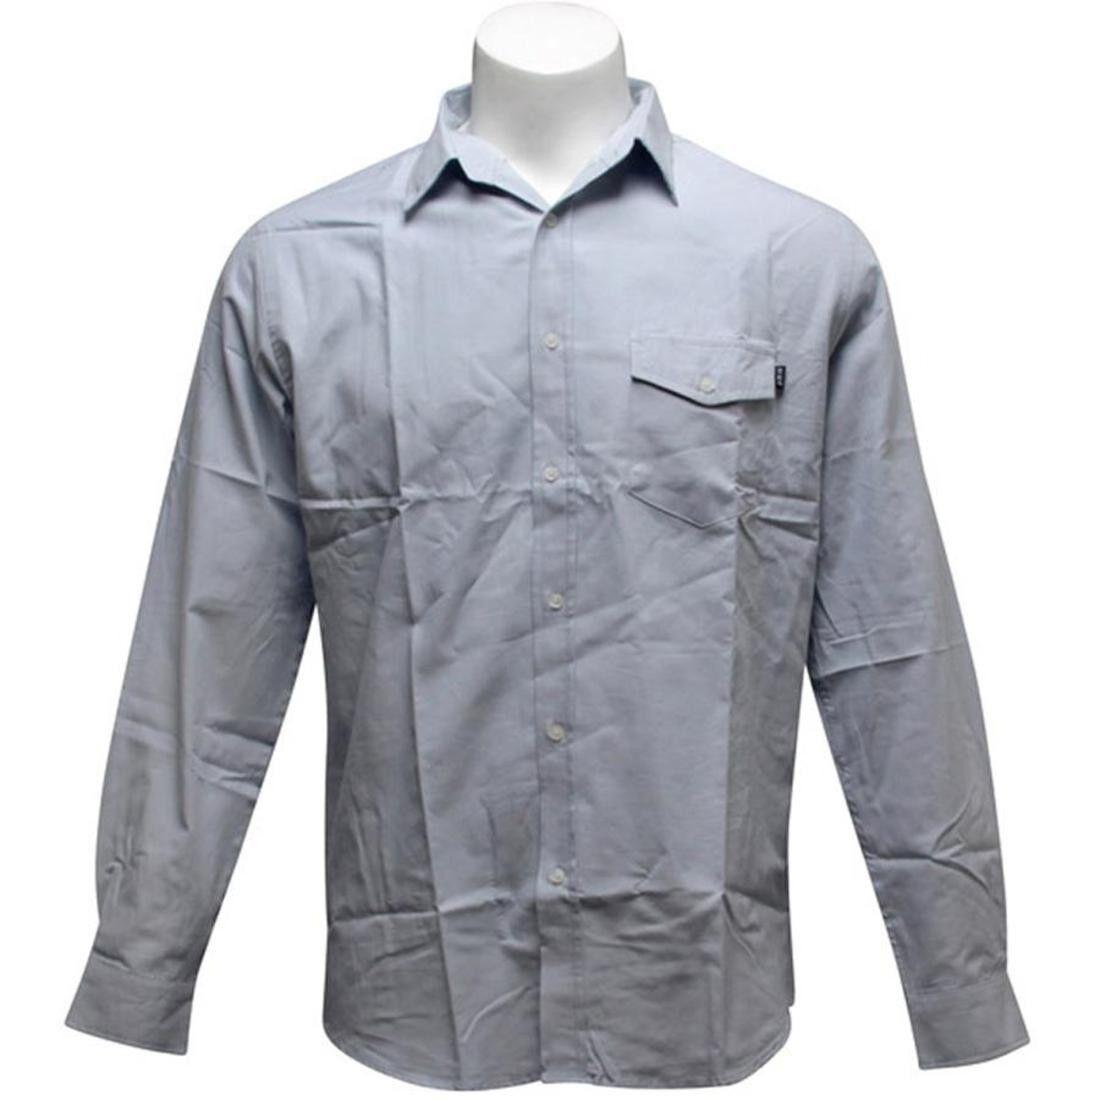 HUFBU03PKXPDB $67.99 HUF Pocket Oxford Woven Shirt powder blue